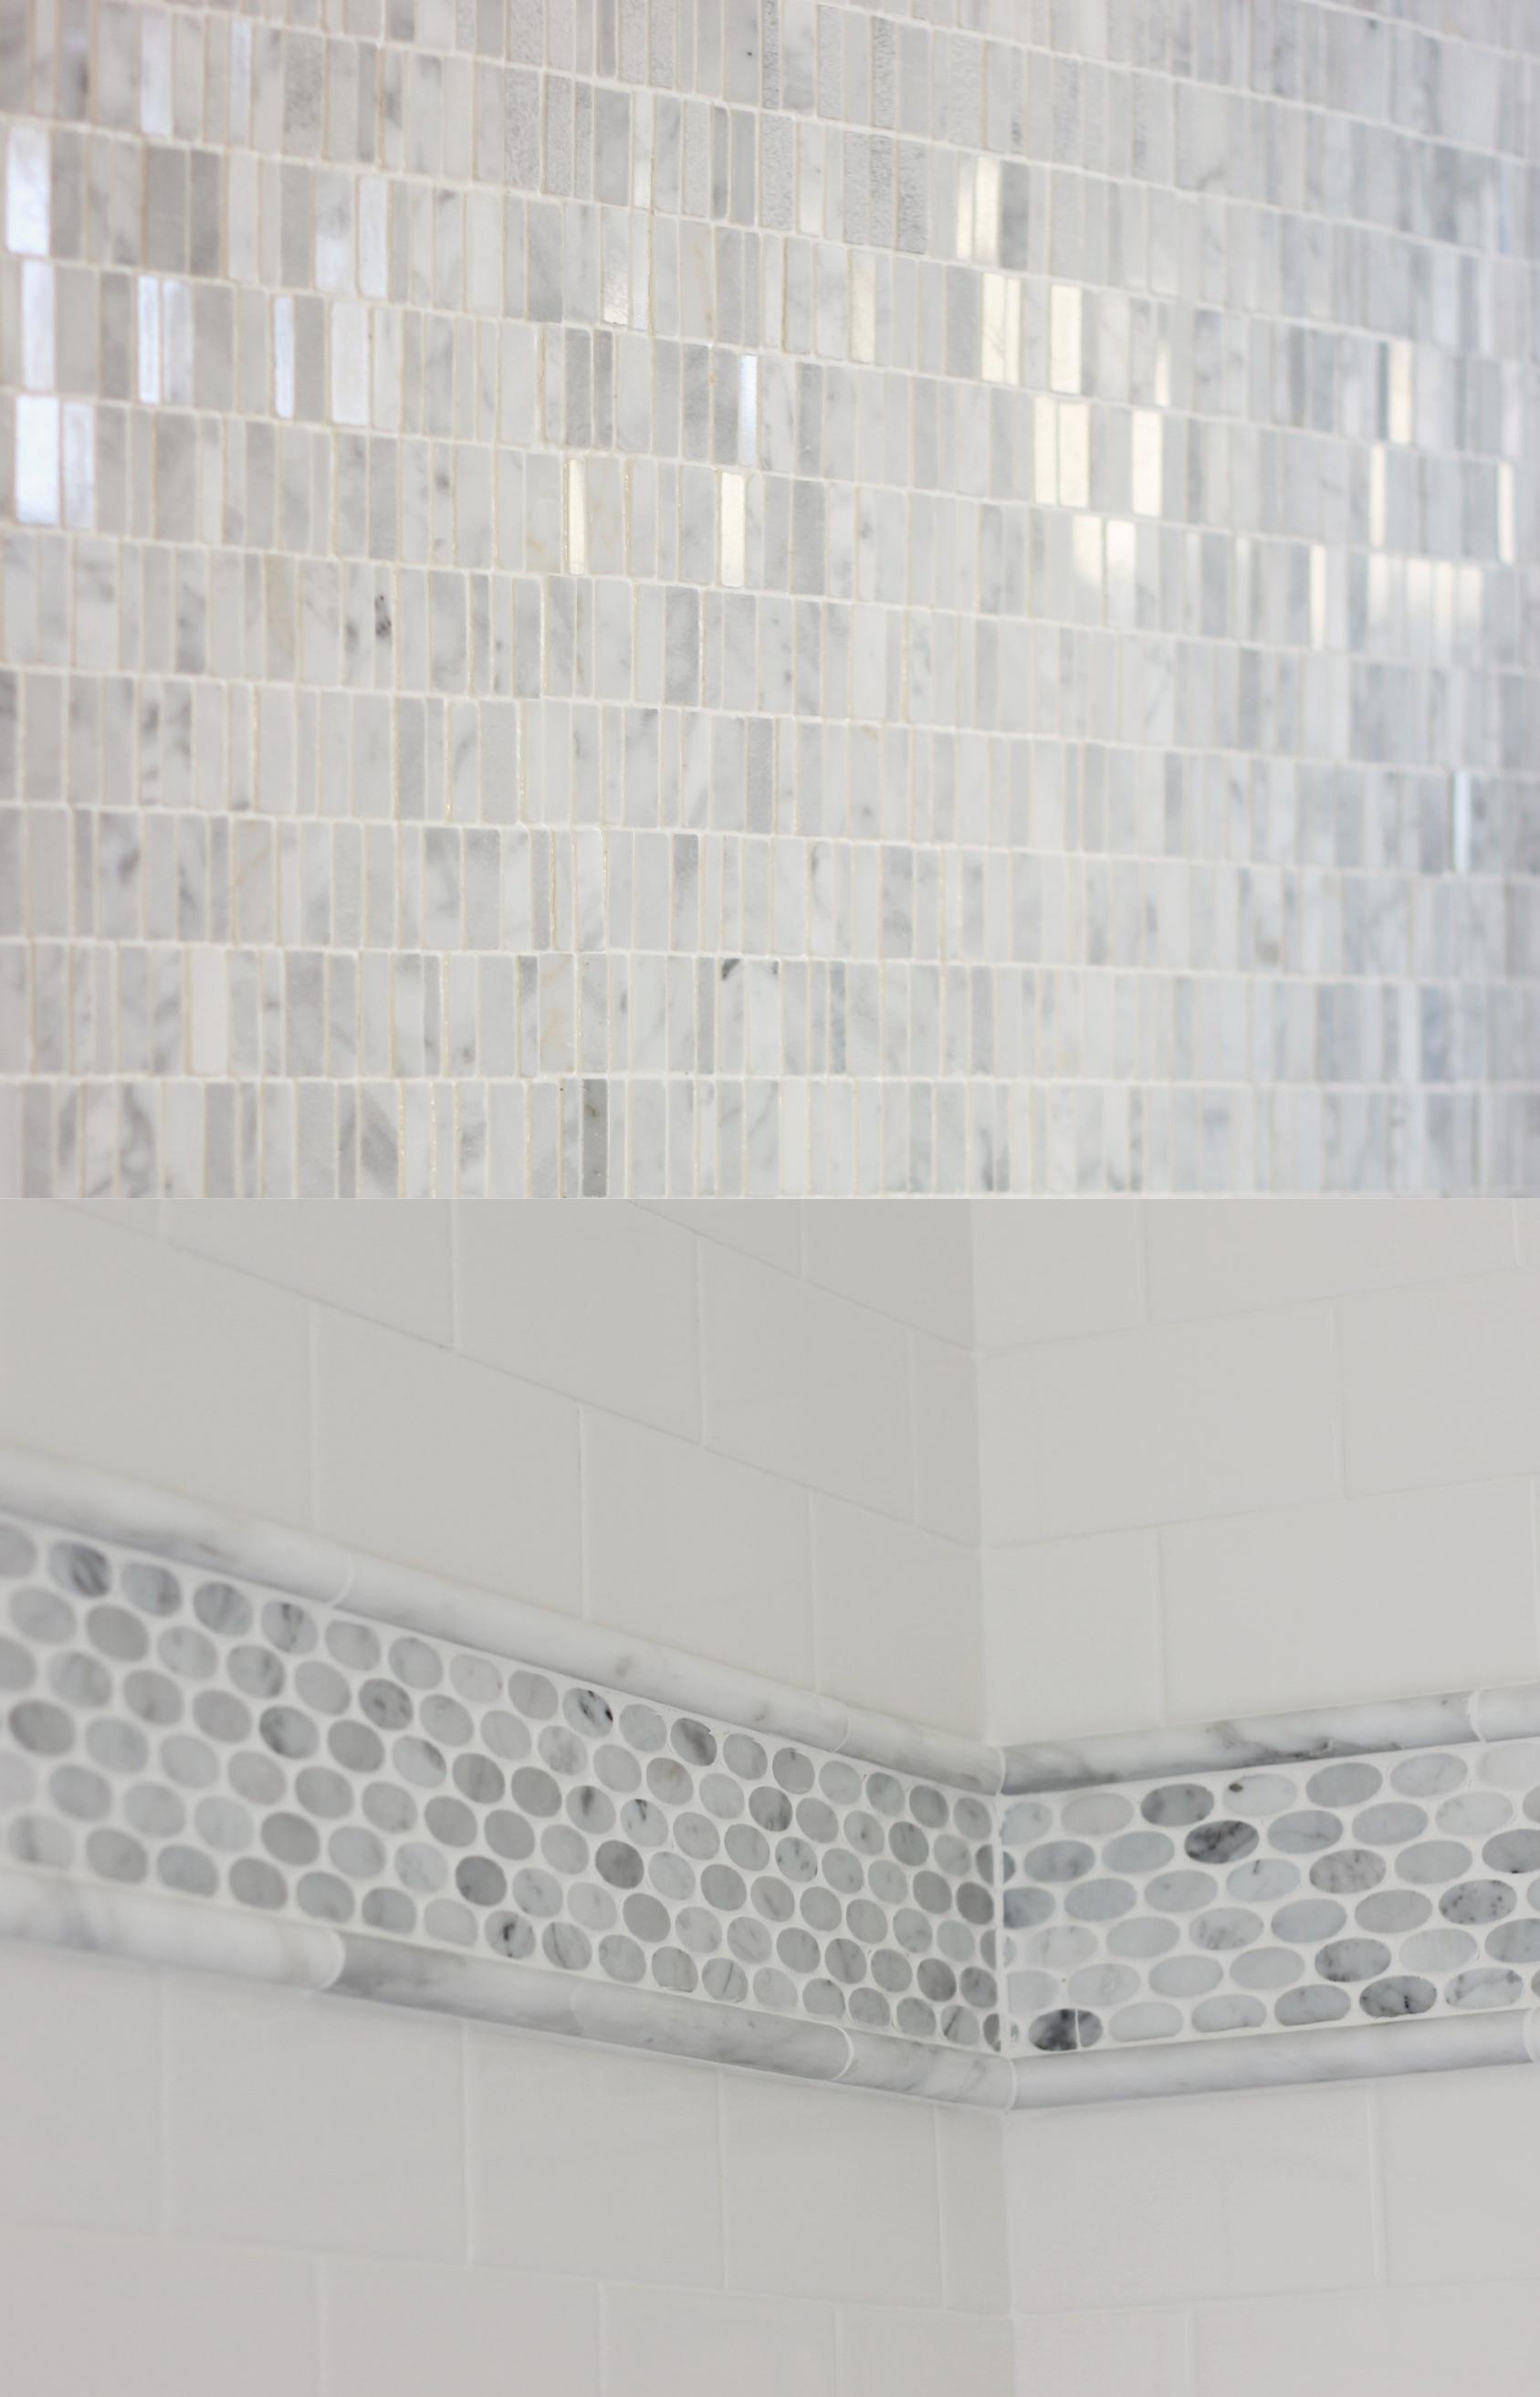 Daltile Bathroom Tile Feature Daltile December 2014 Tileletter